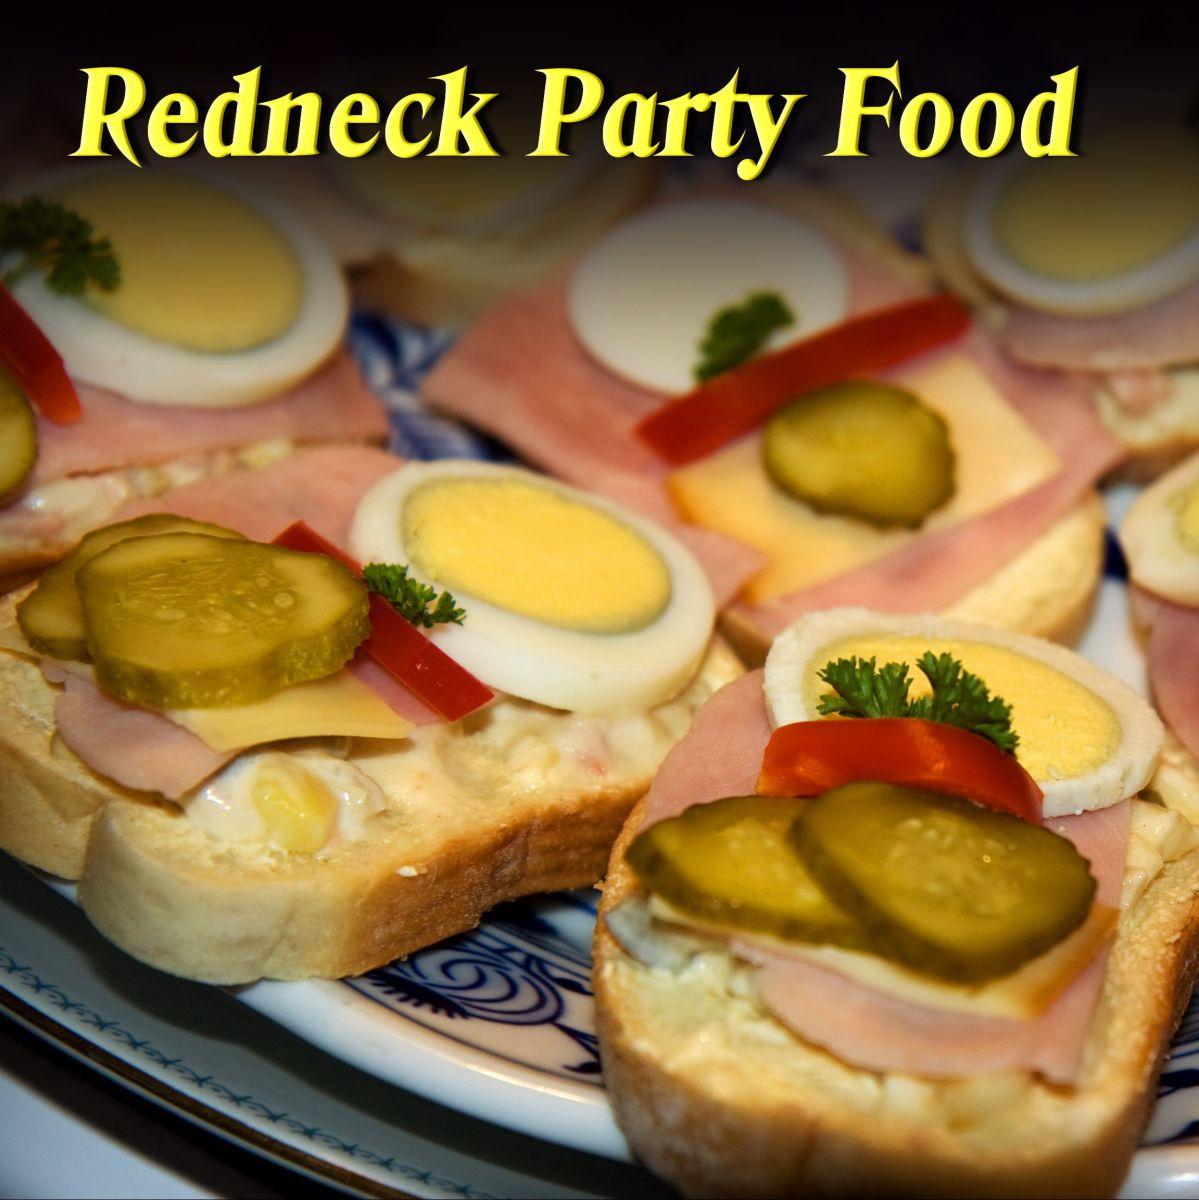 Redneck Party Food